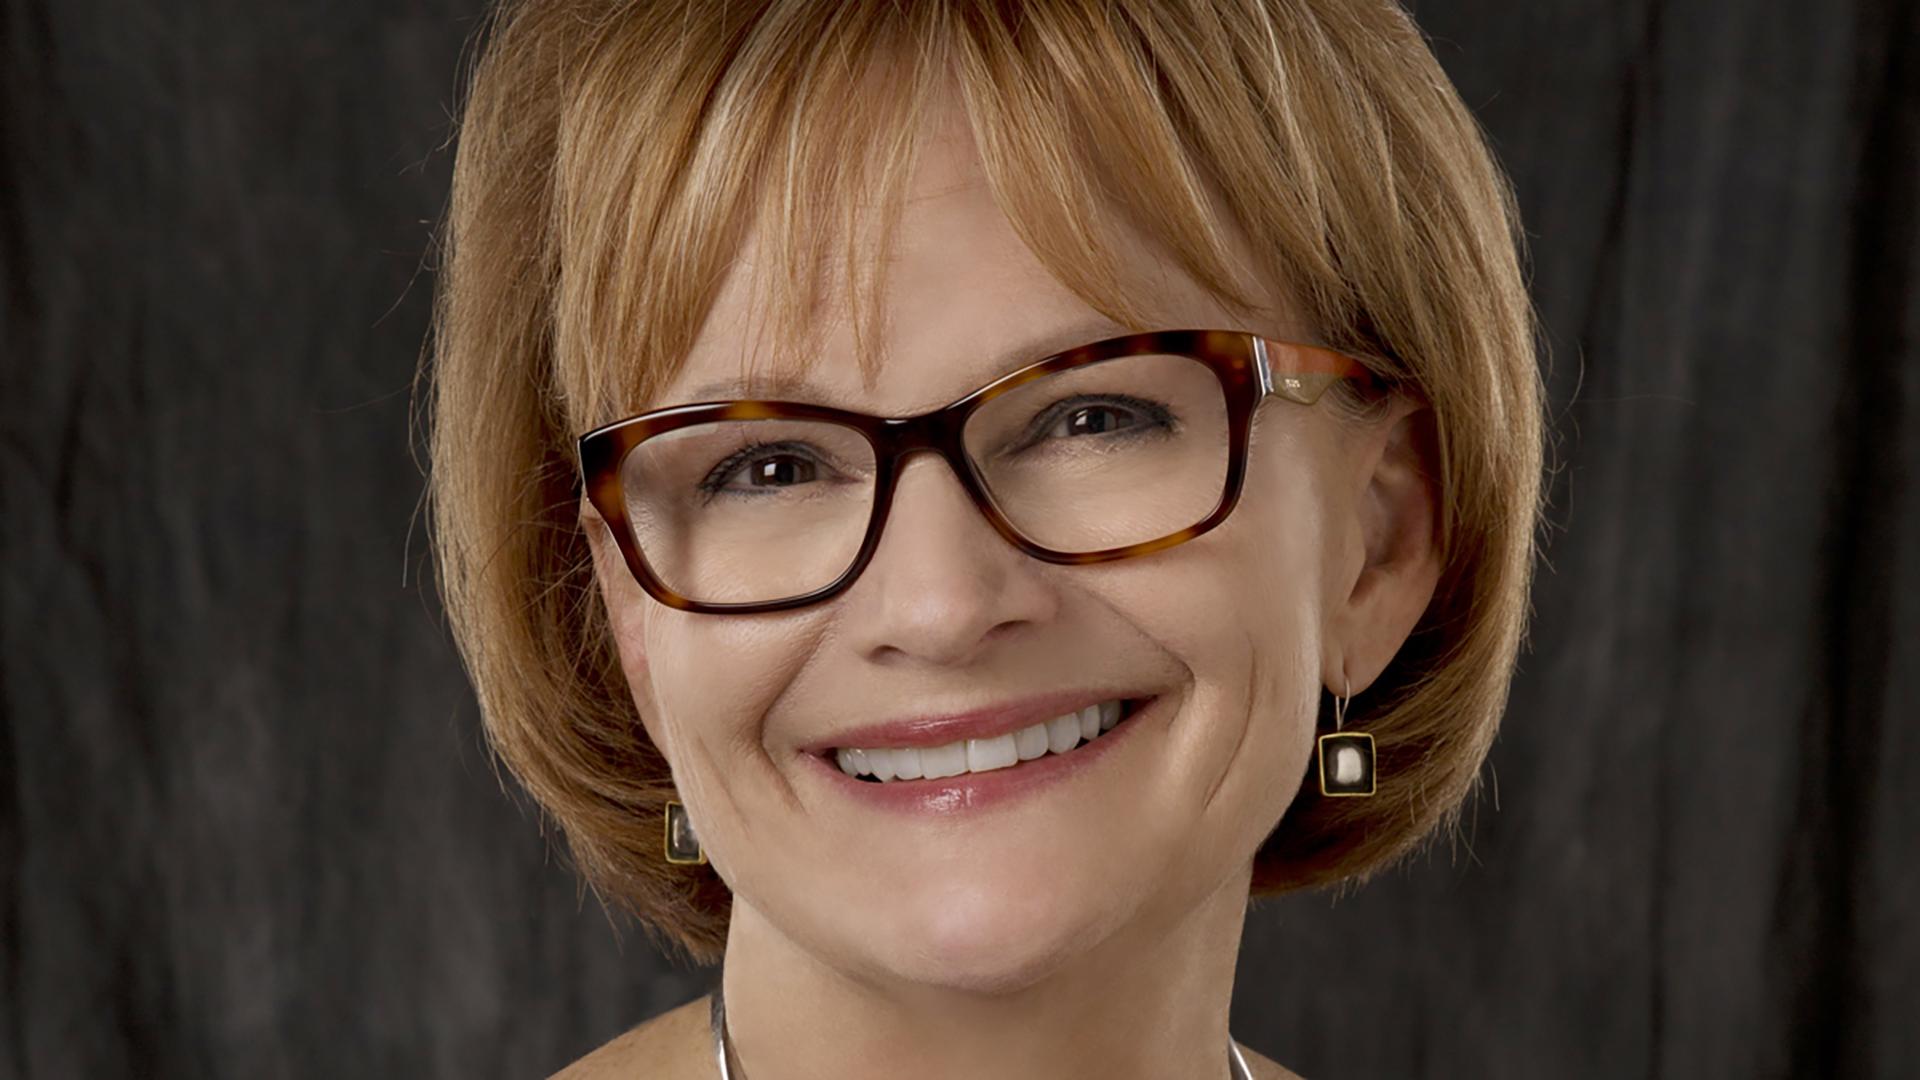 Carol Lovelady tabbed as new PPHM director